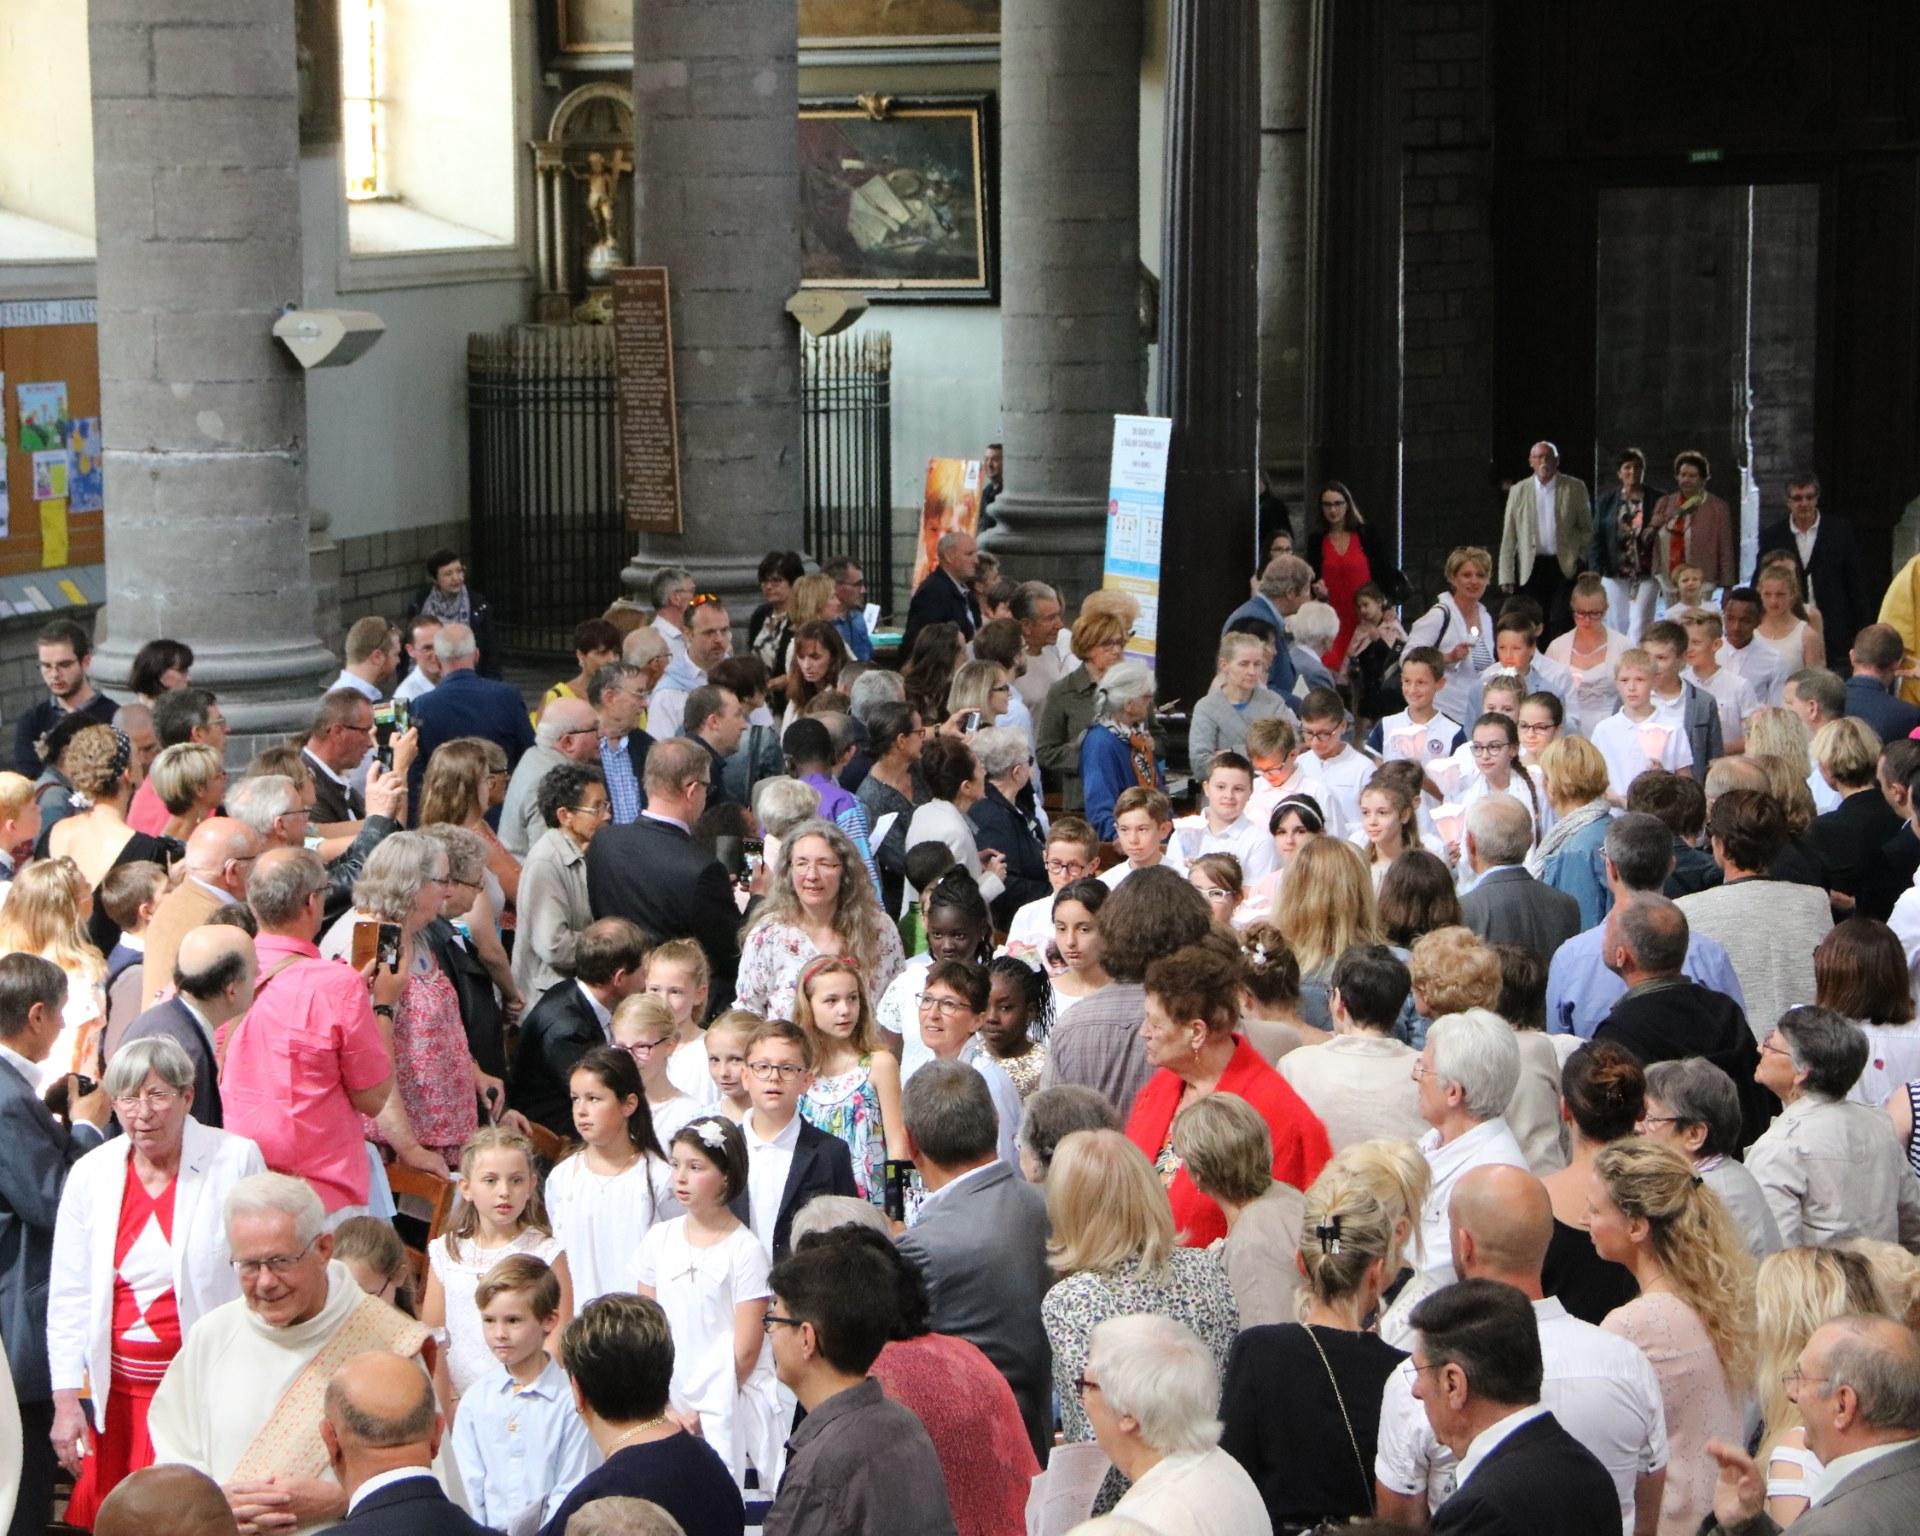 1806_Vignette Fête du St-Sacrement Messe 1